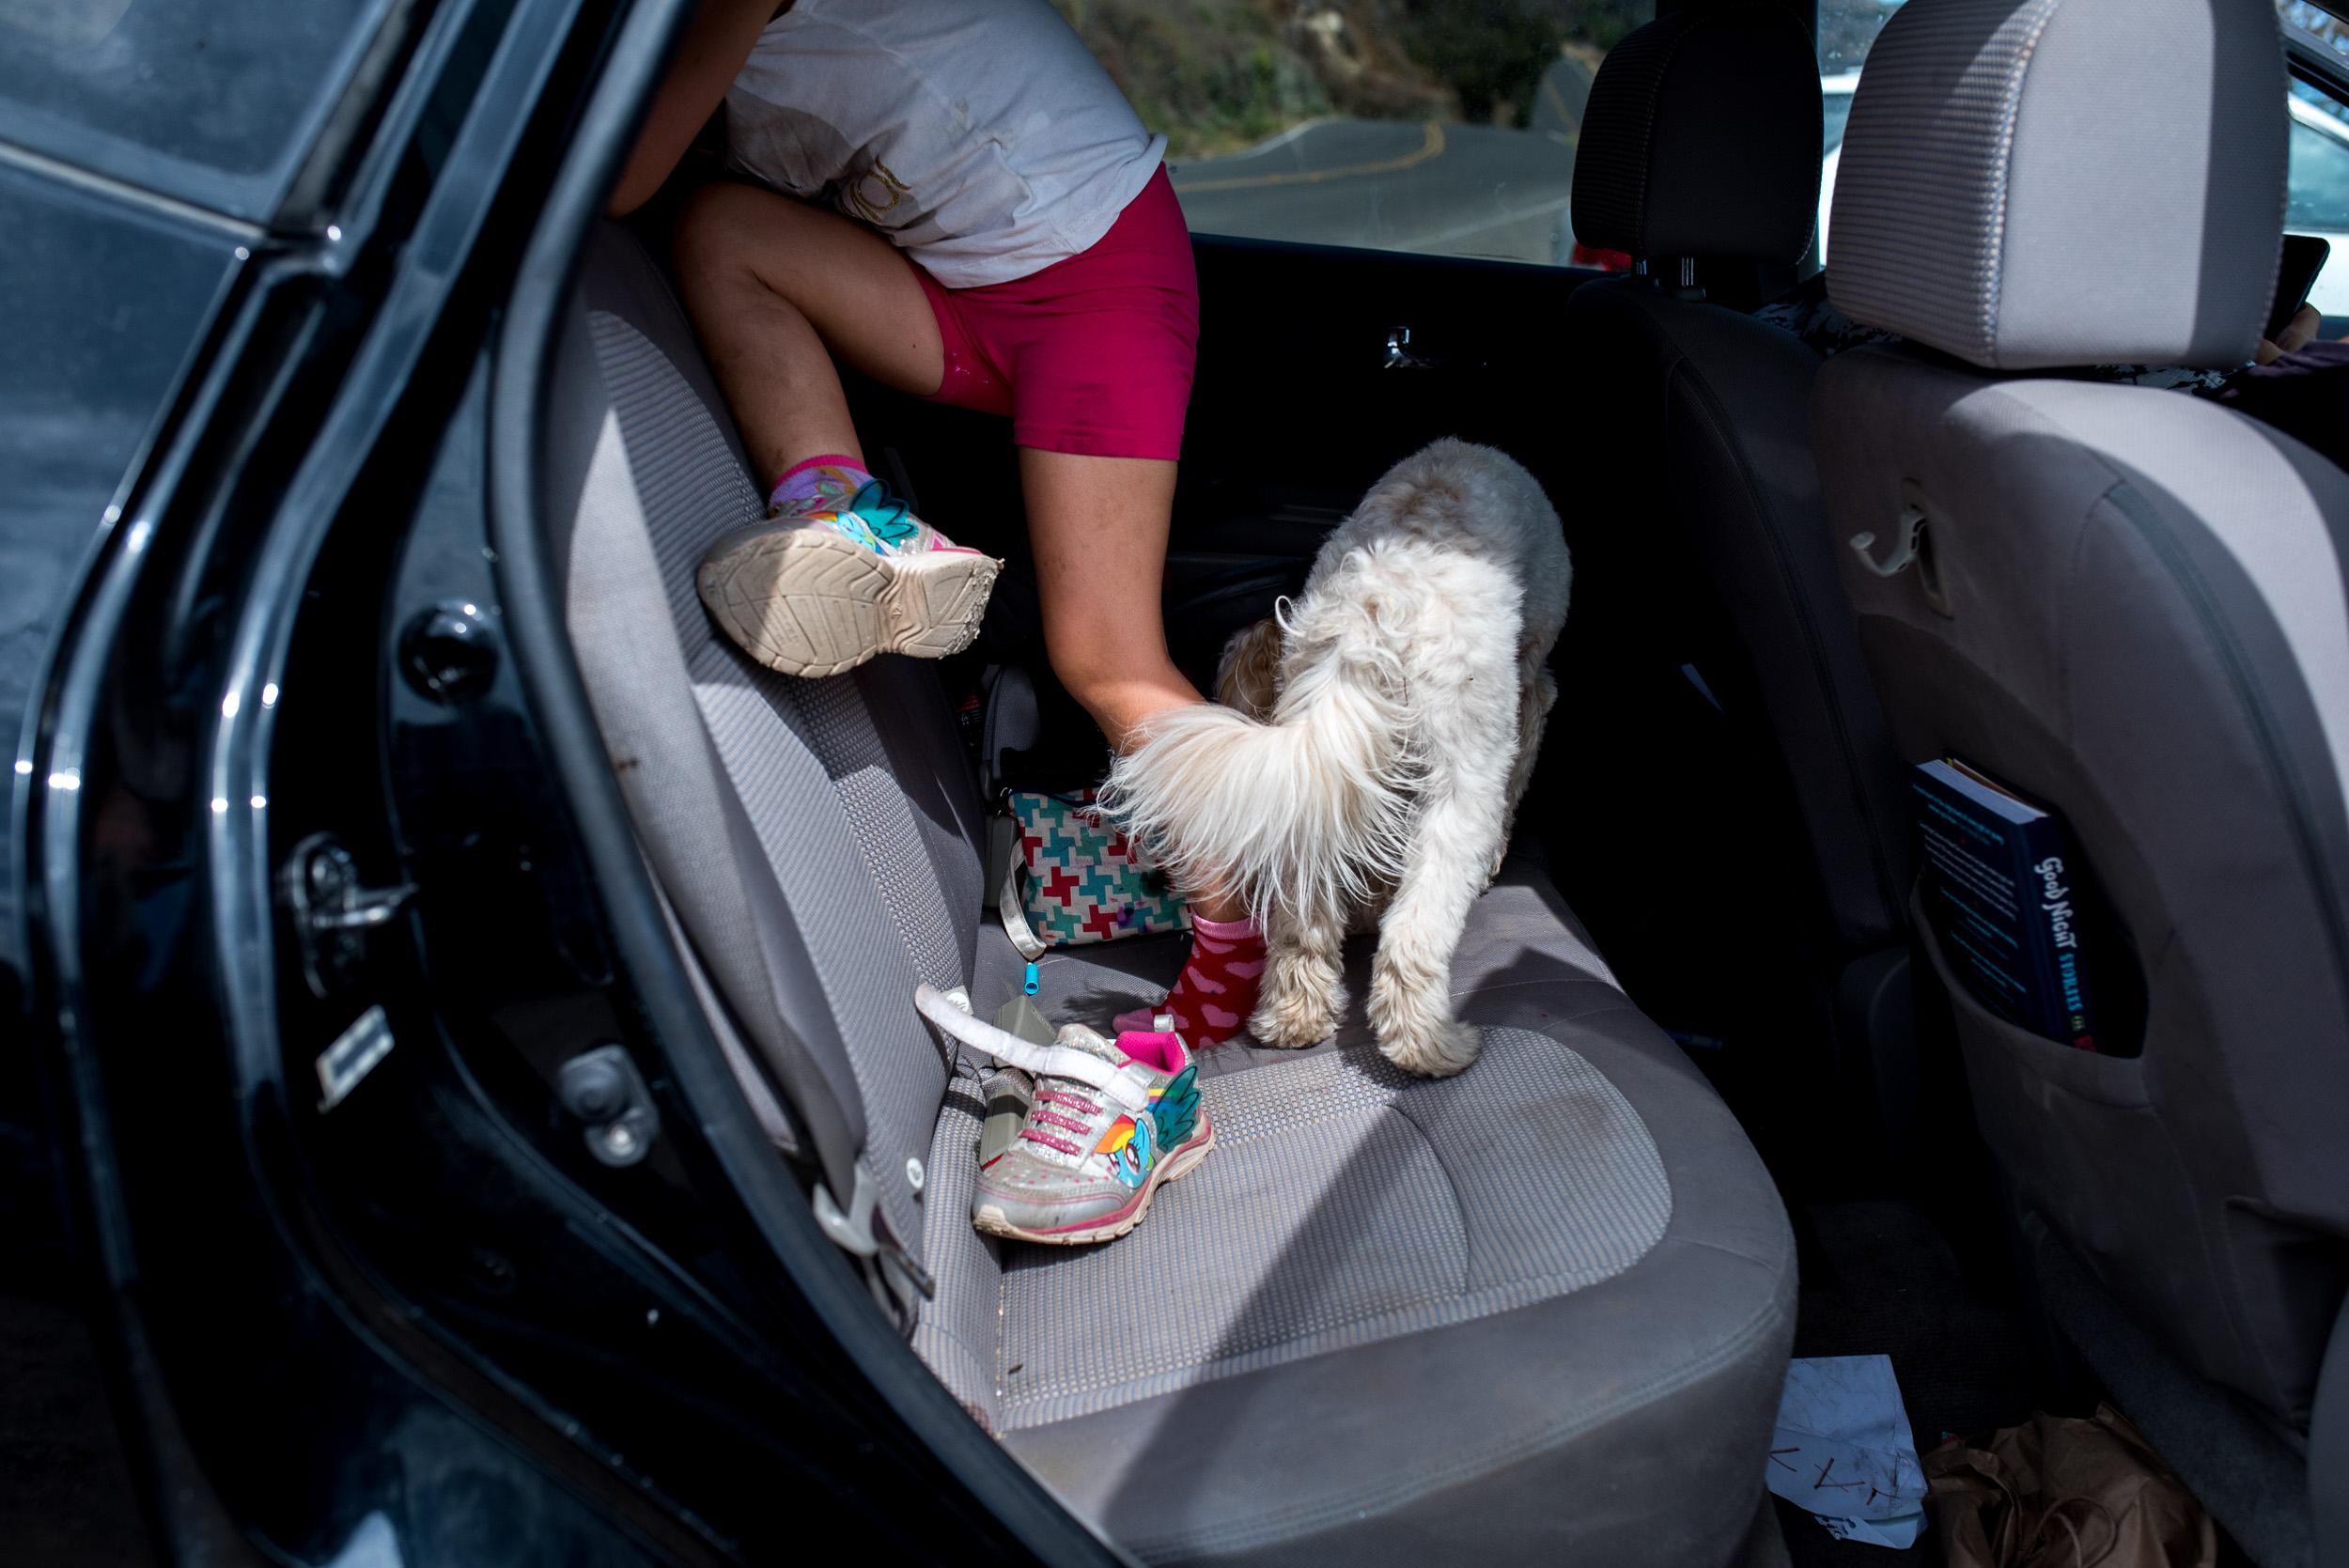 Deborah-Barak-Documentary-Family-Photography-Brooklyn_NYC_girl-and-dog-in-car.jpg